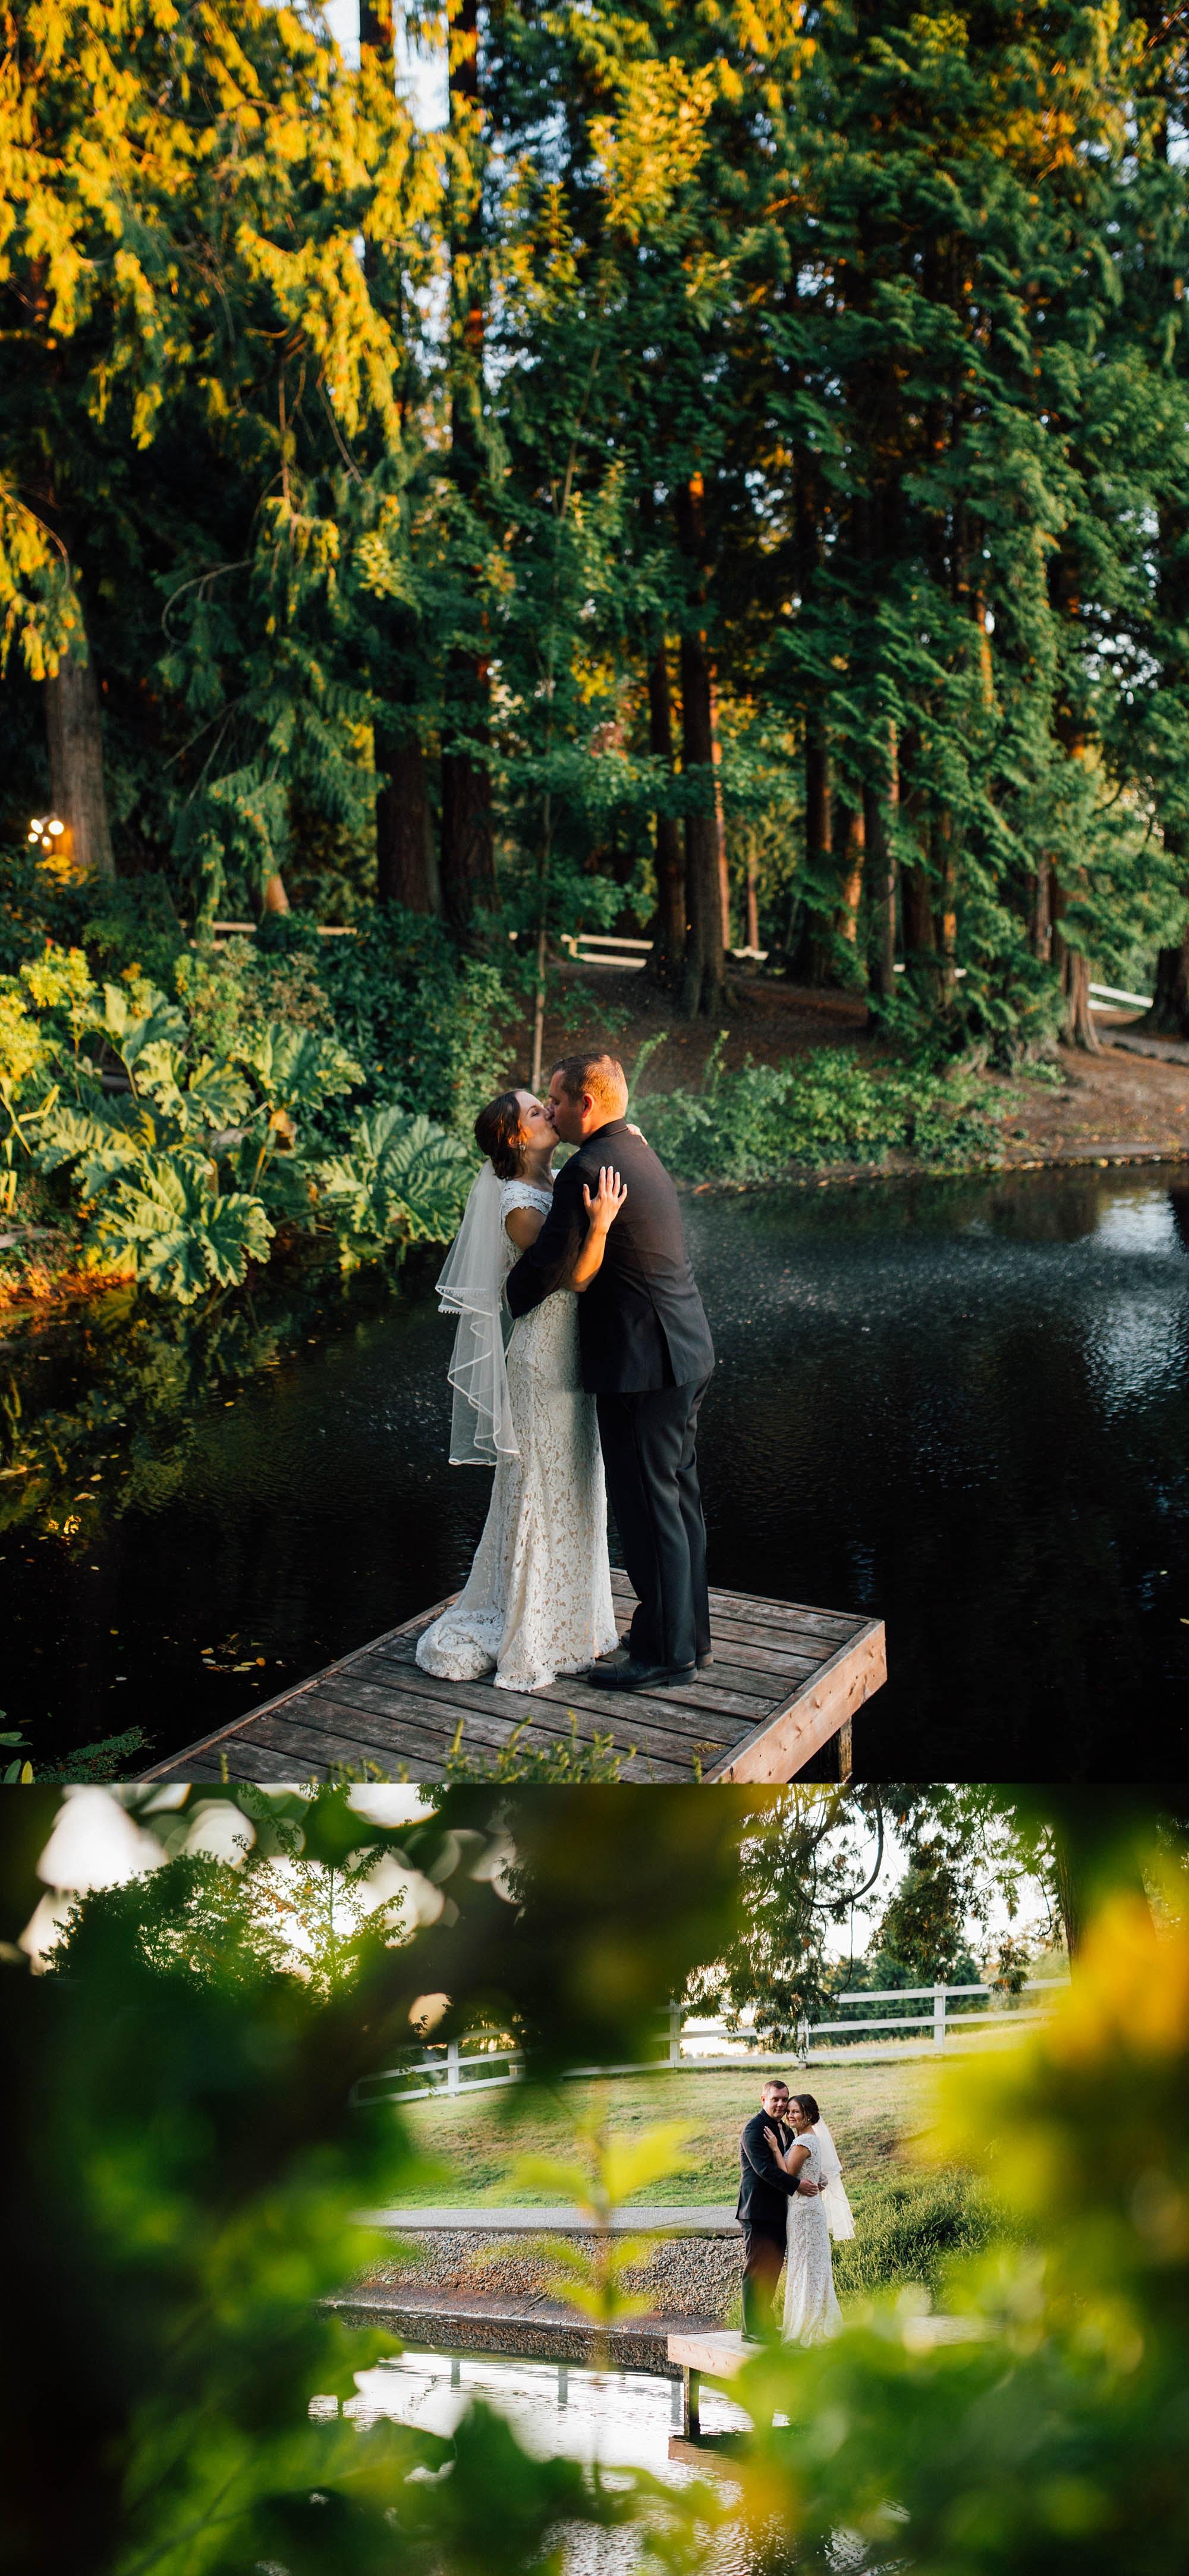 ashley_vos_seattle_ wedding_photographer_0200.jpg